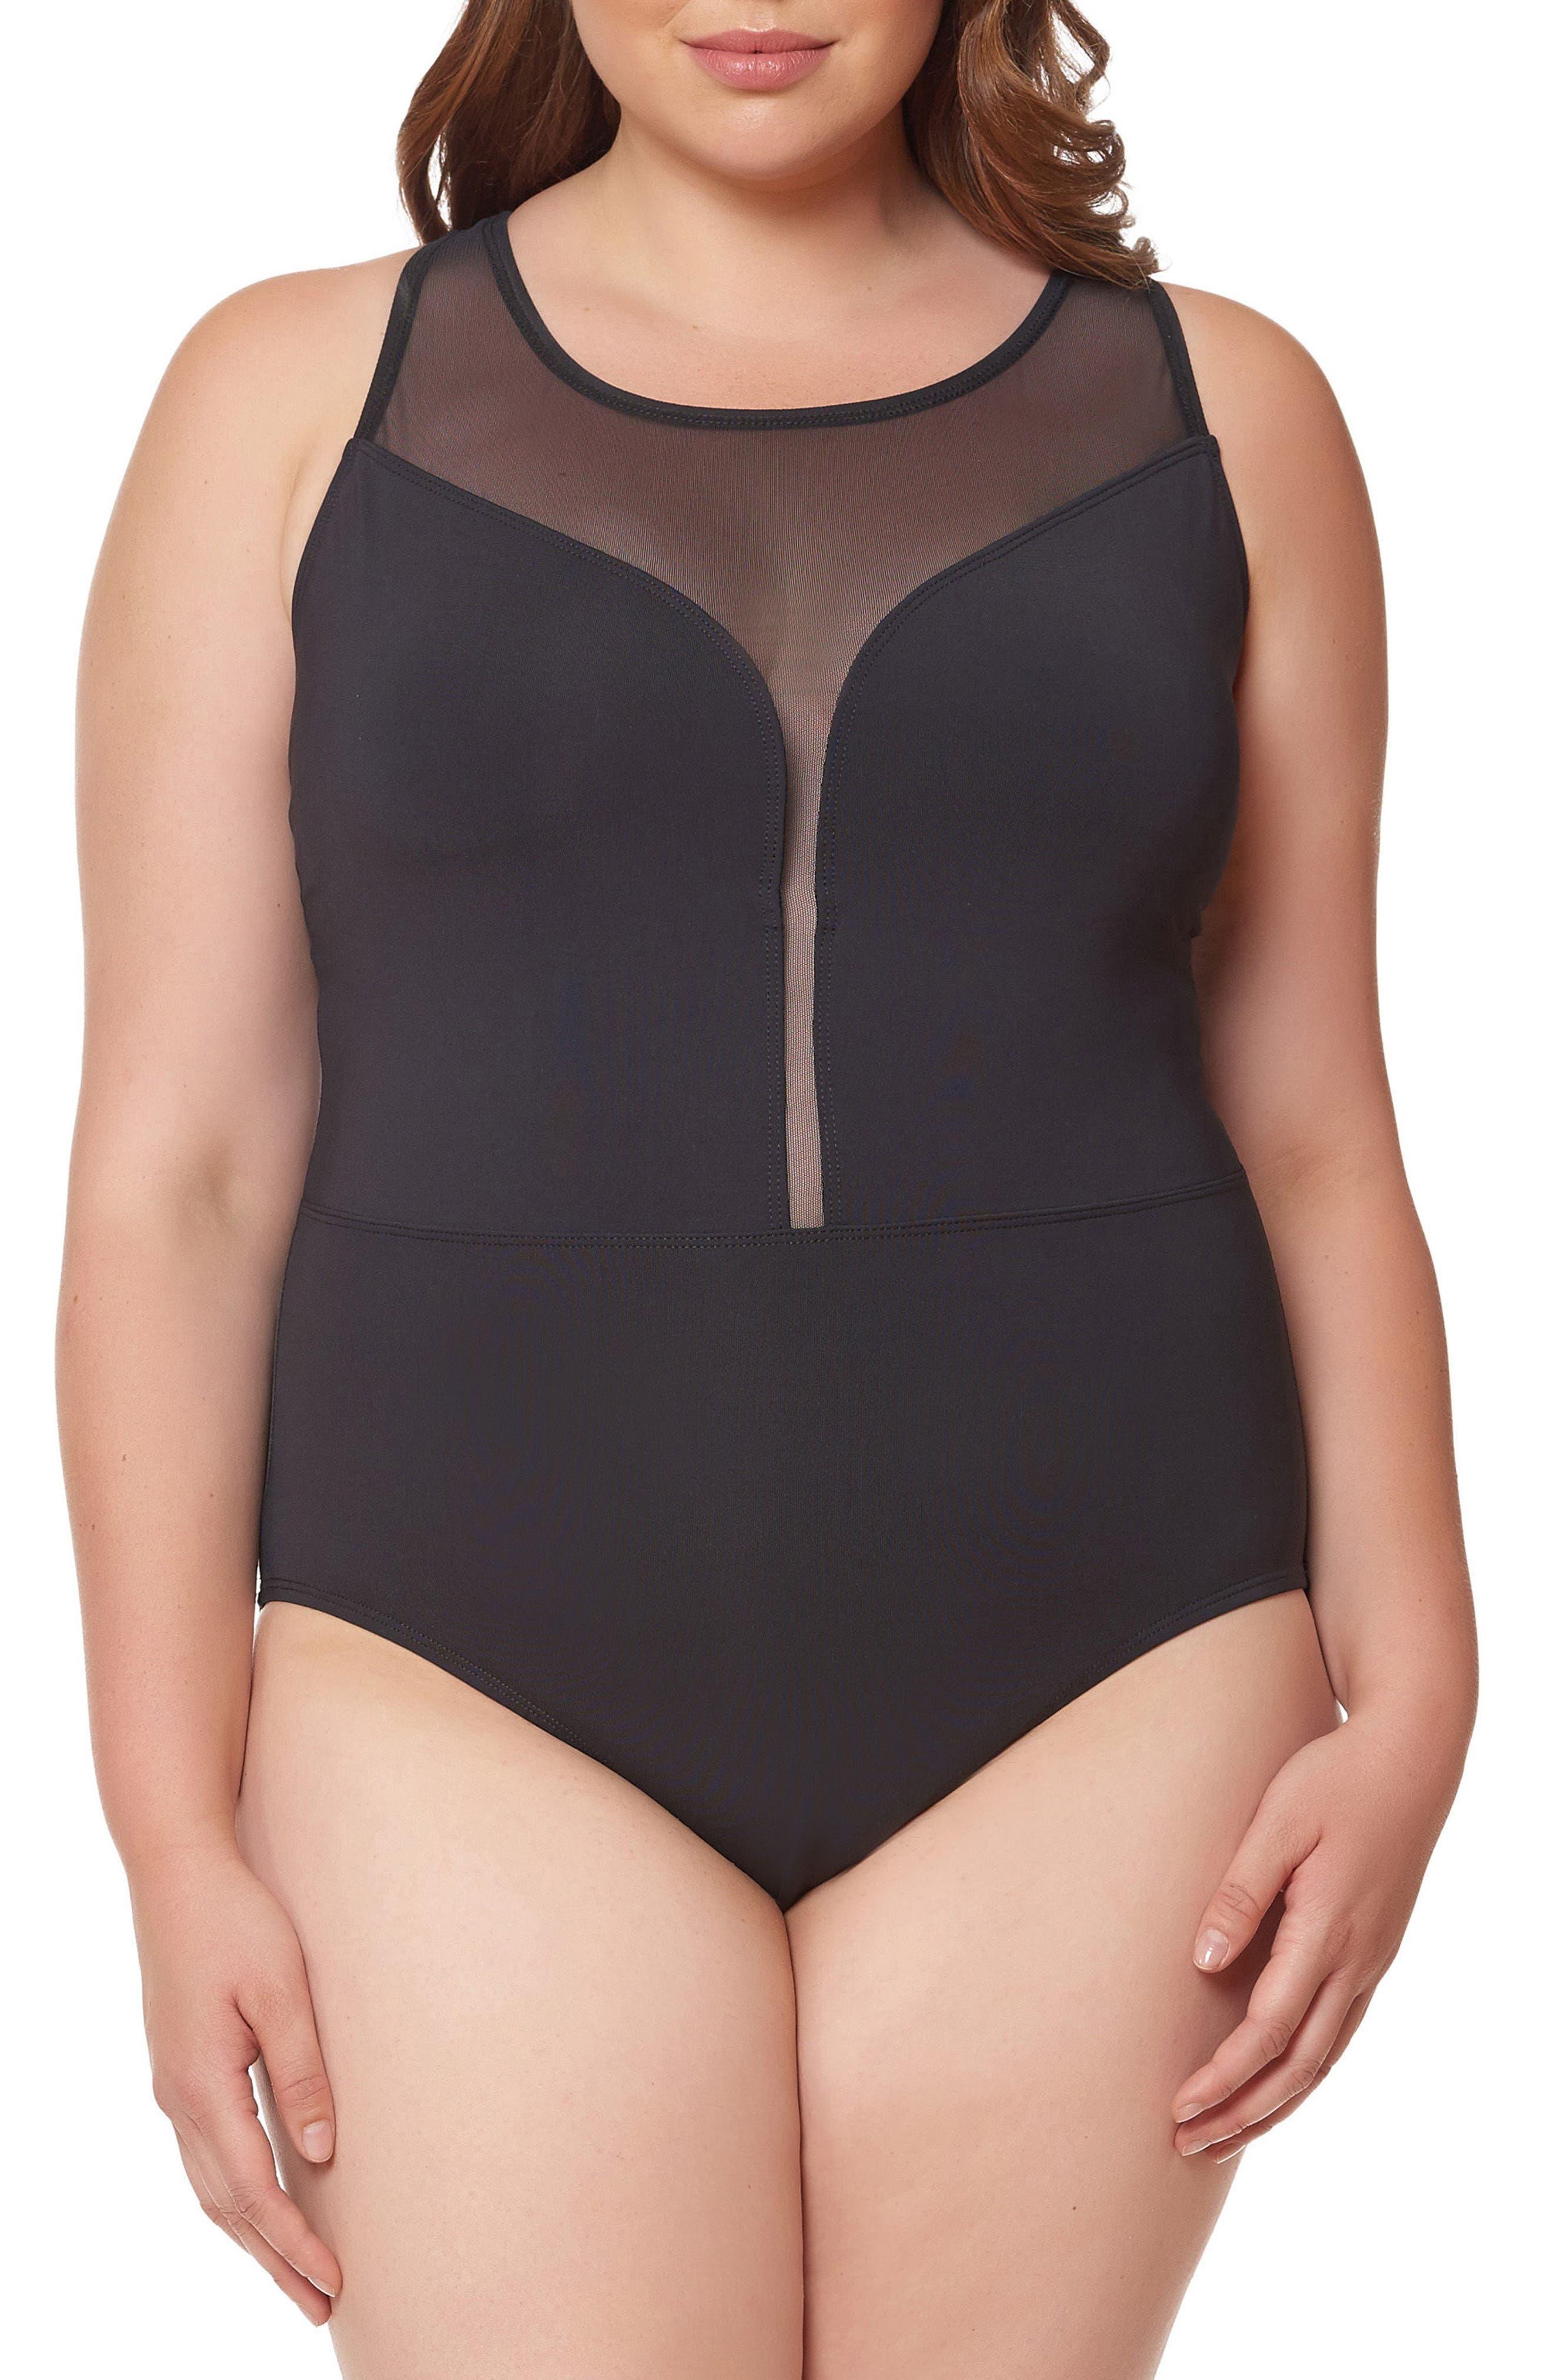 Plus Size Bleu By Rod Beattie Mesh Plunge One-Piece Swimsuit, Black